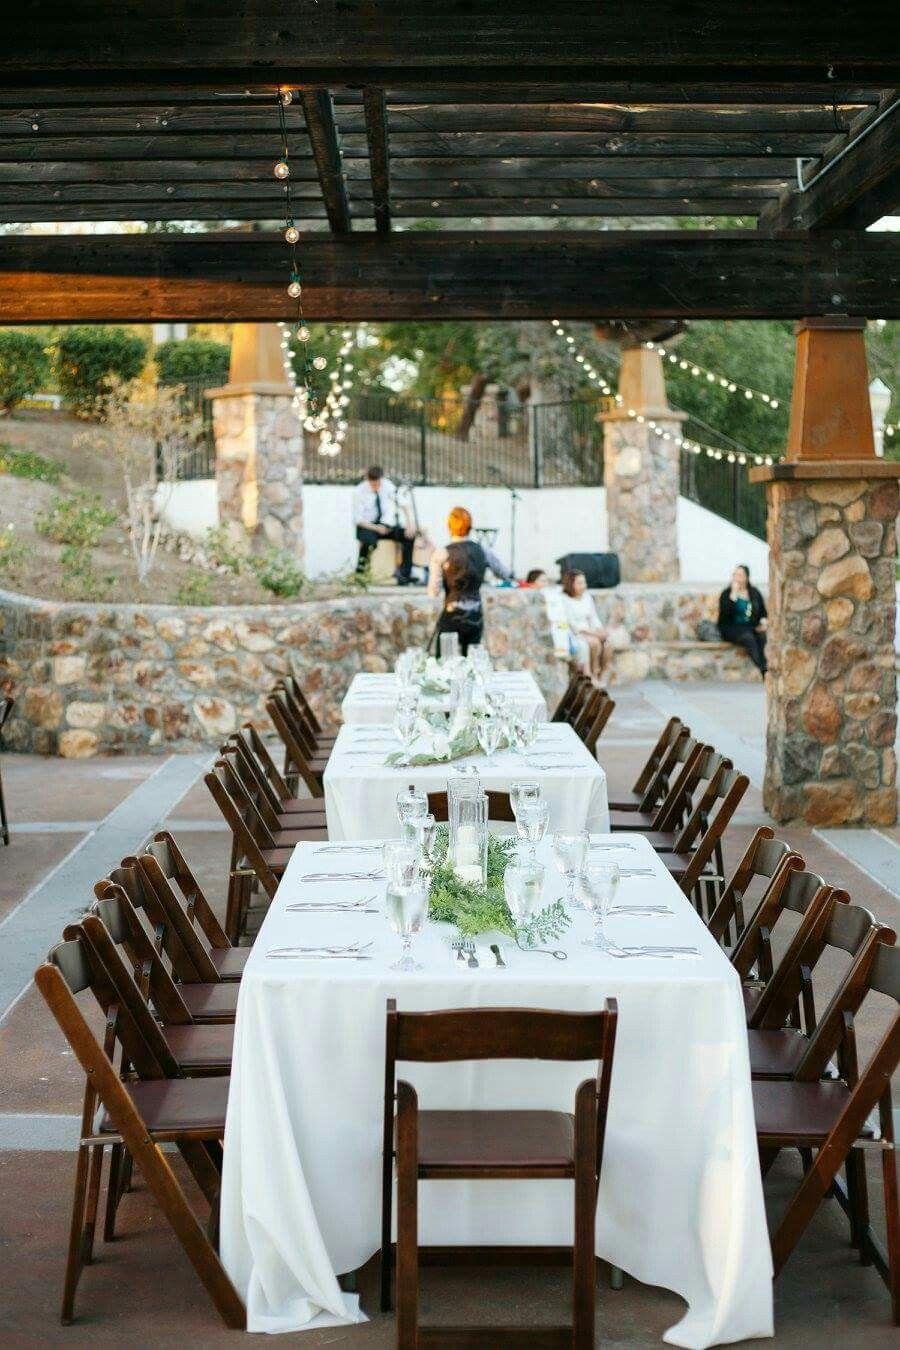 Banquet chairs wedding - Hillcrest Terrace Fullerton California Wedding Banquet Table Decor Outdoor Fall Evening Wedding Reception Magnolia